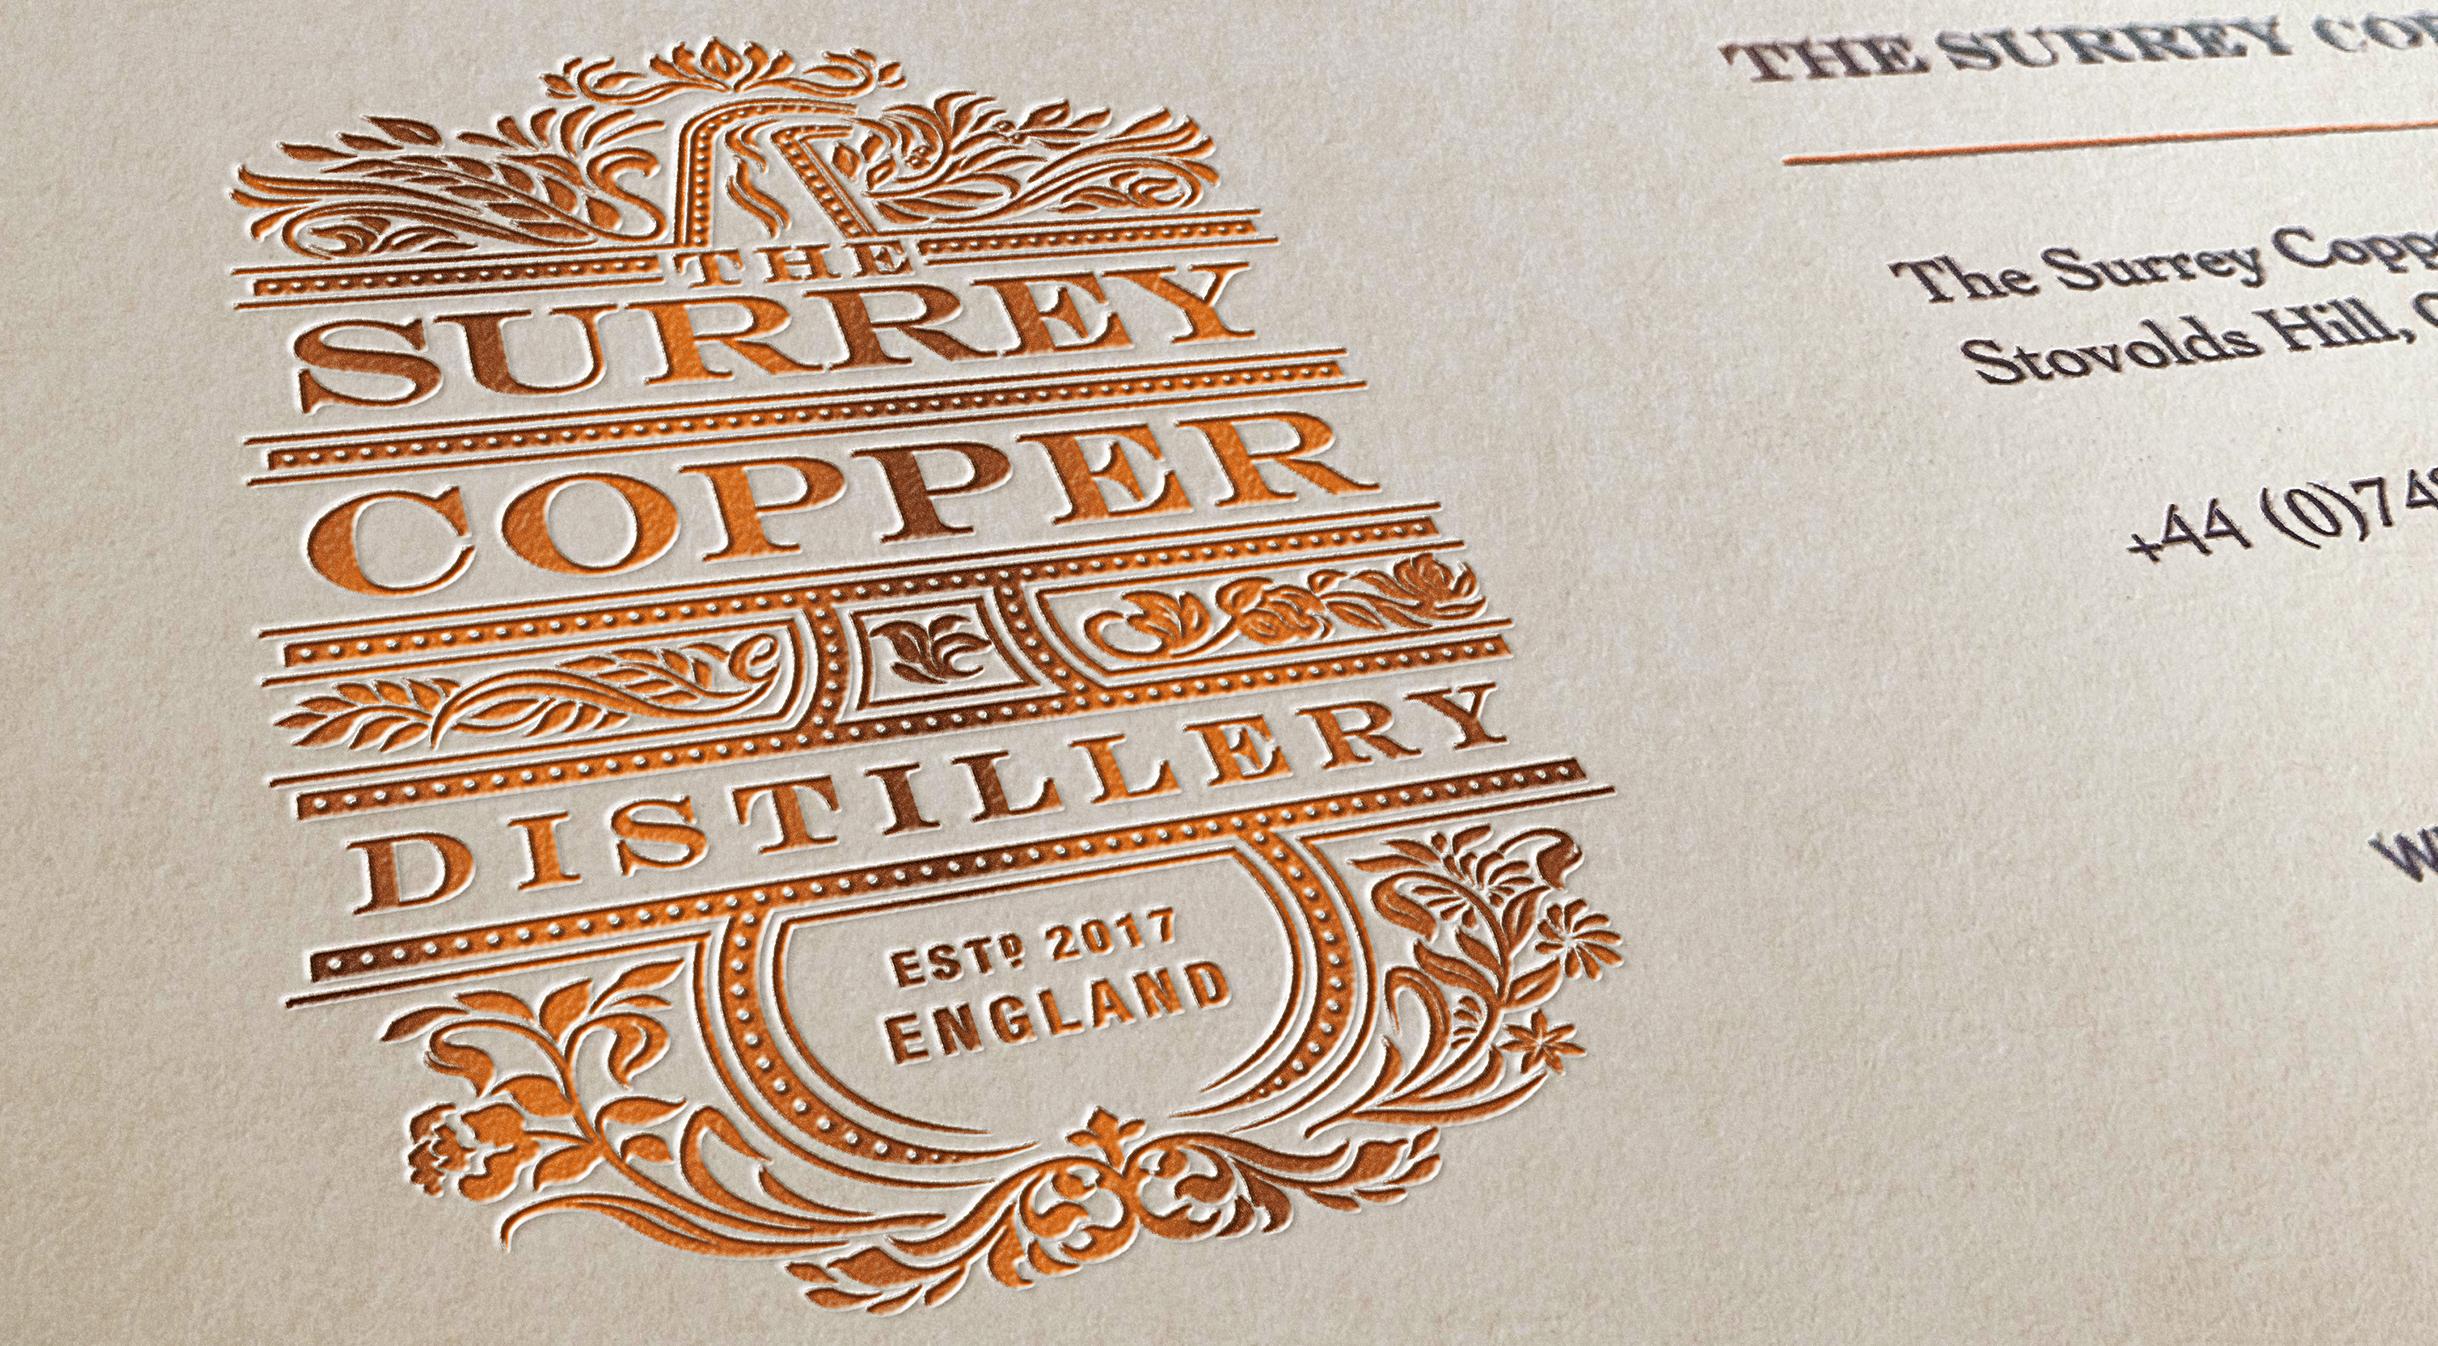 Surrey Copper D 1.jpg